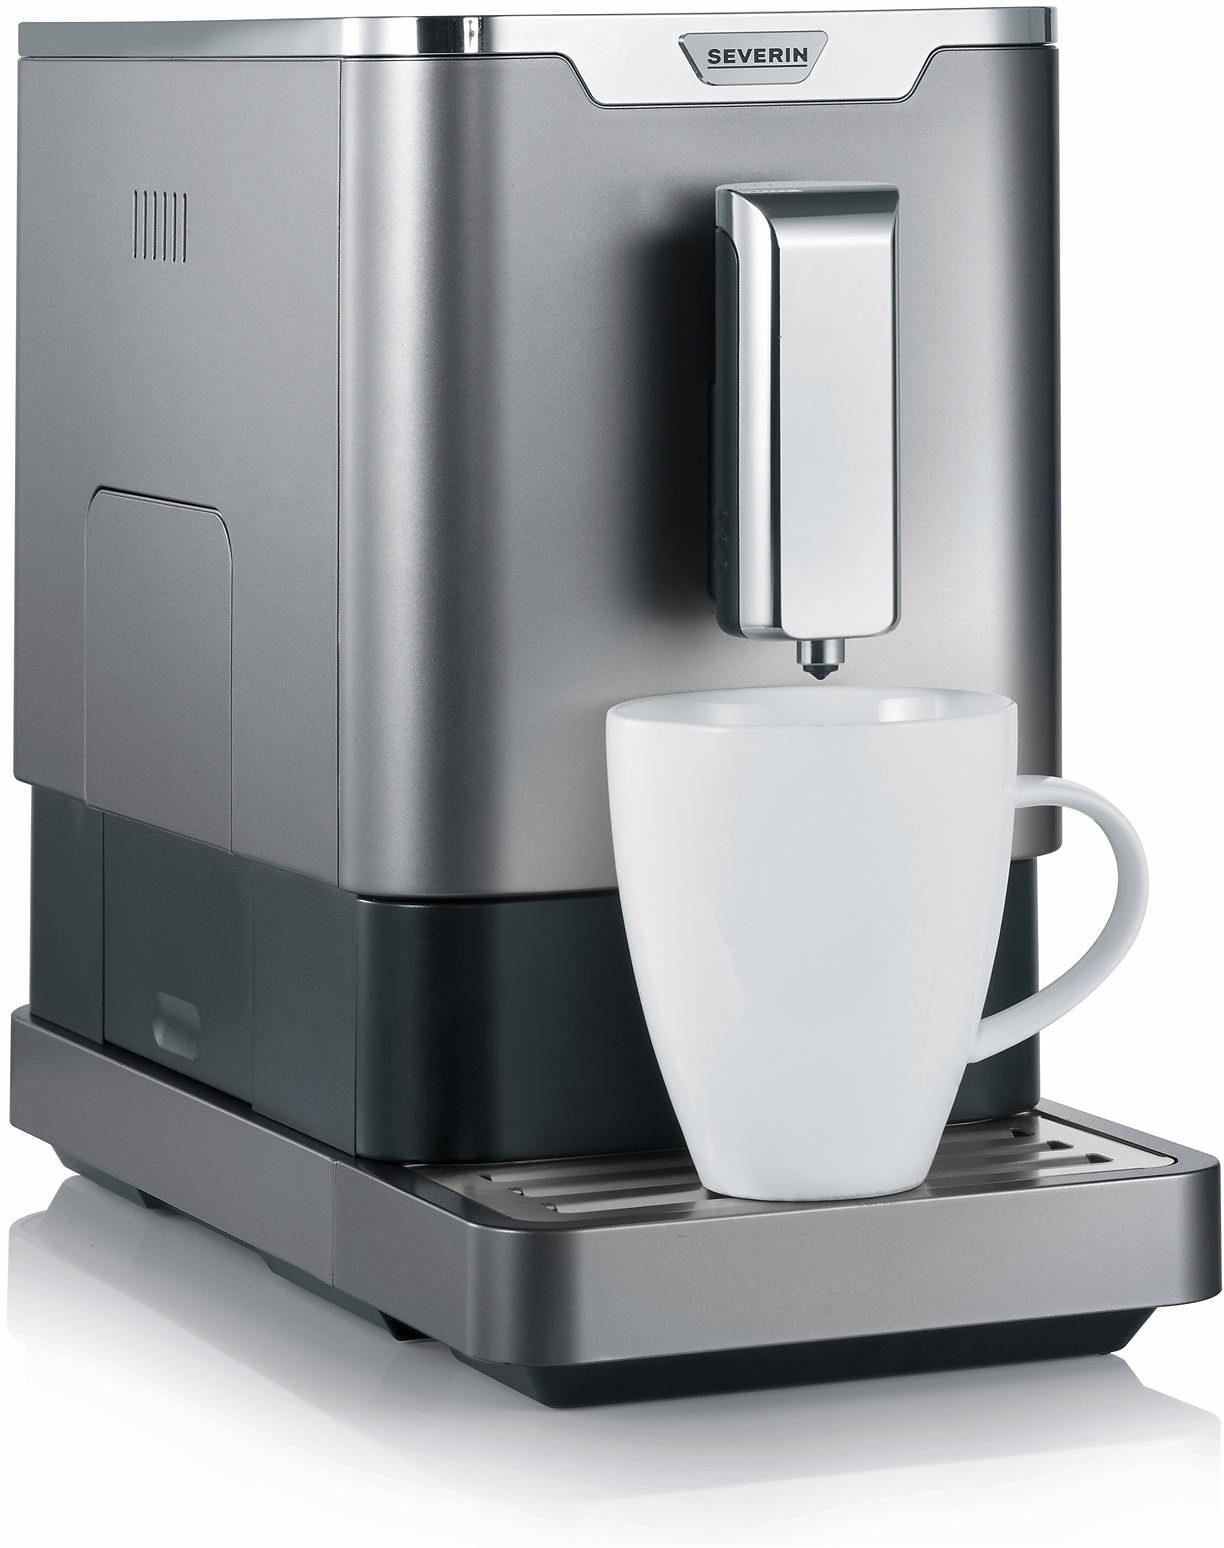 Severin Kaffeevollautomat KV 8090, ultra-schlankes Design